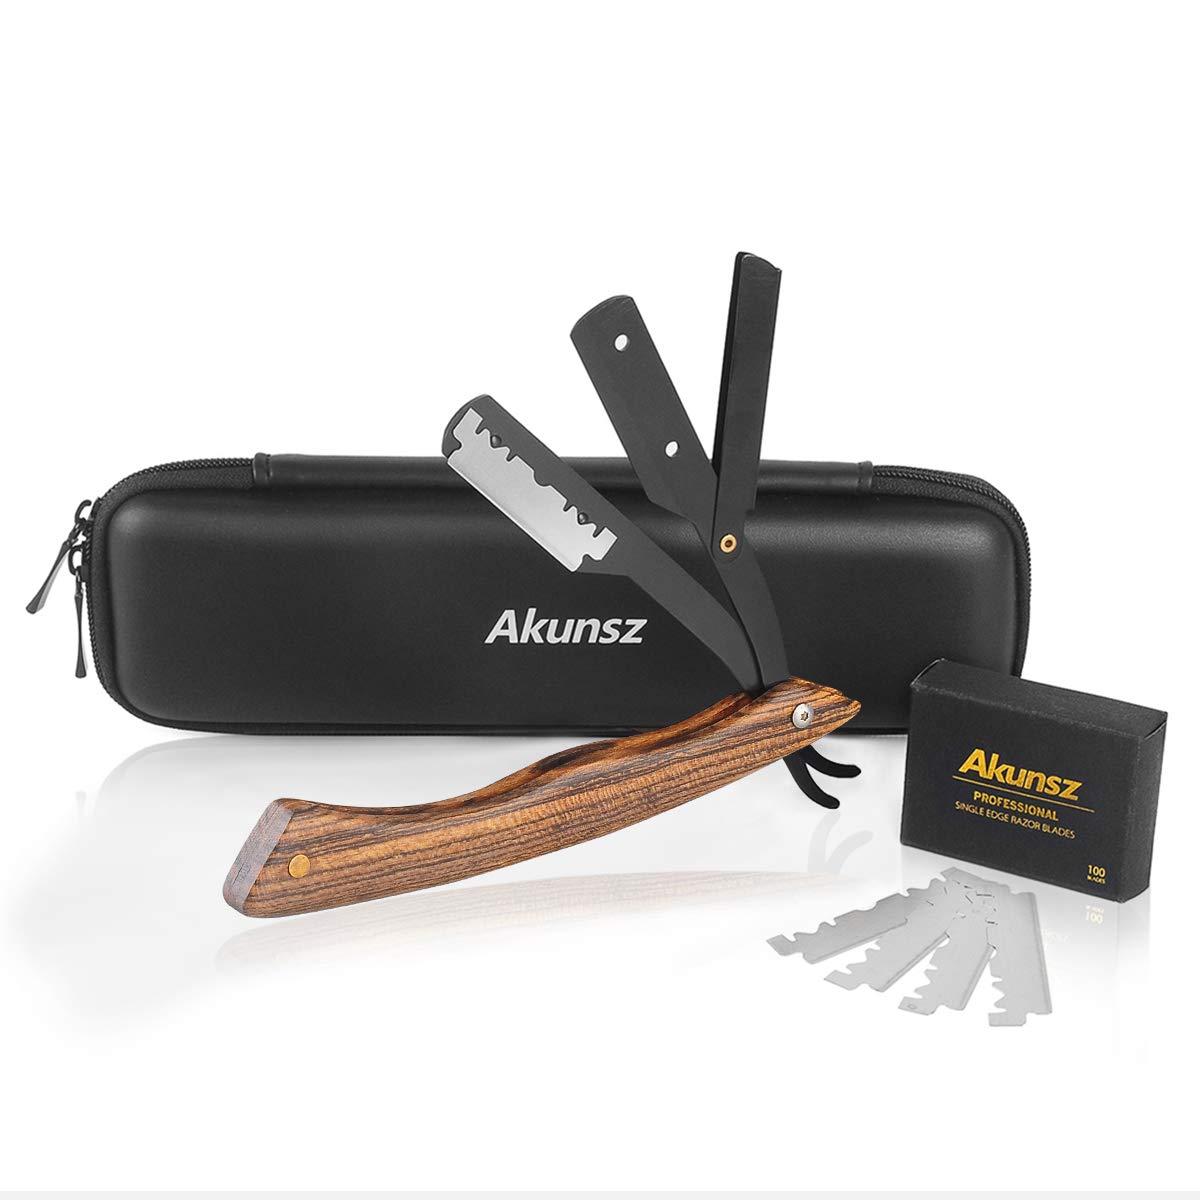 Straight Edge Razor AKUNSZ Professional Black Barber Straight Razor with 100 Single Edge Razor Blades and Barber Razor Case Garapa wooden Handle Ltd.